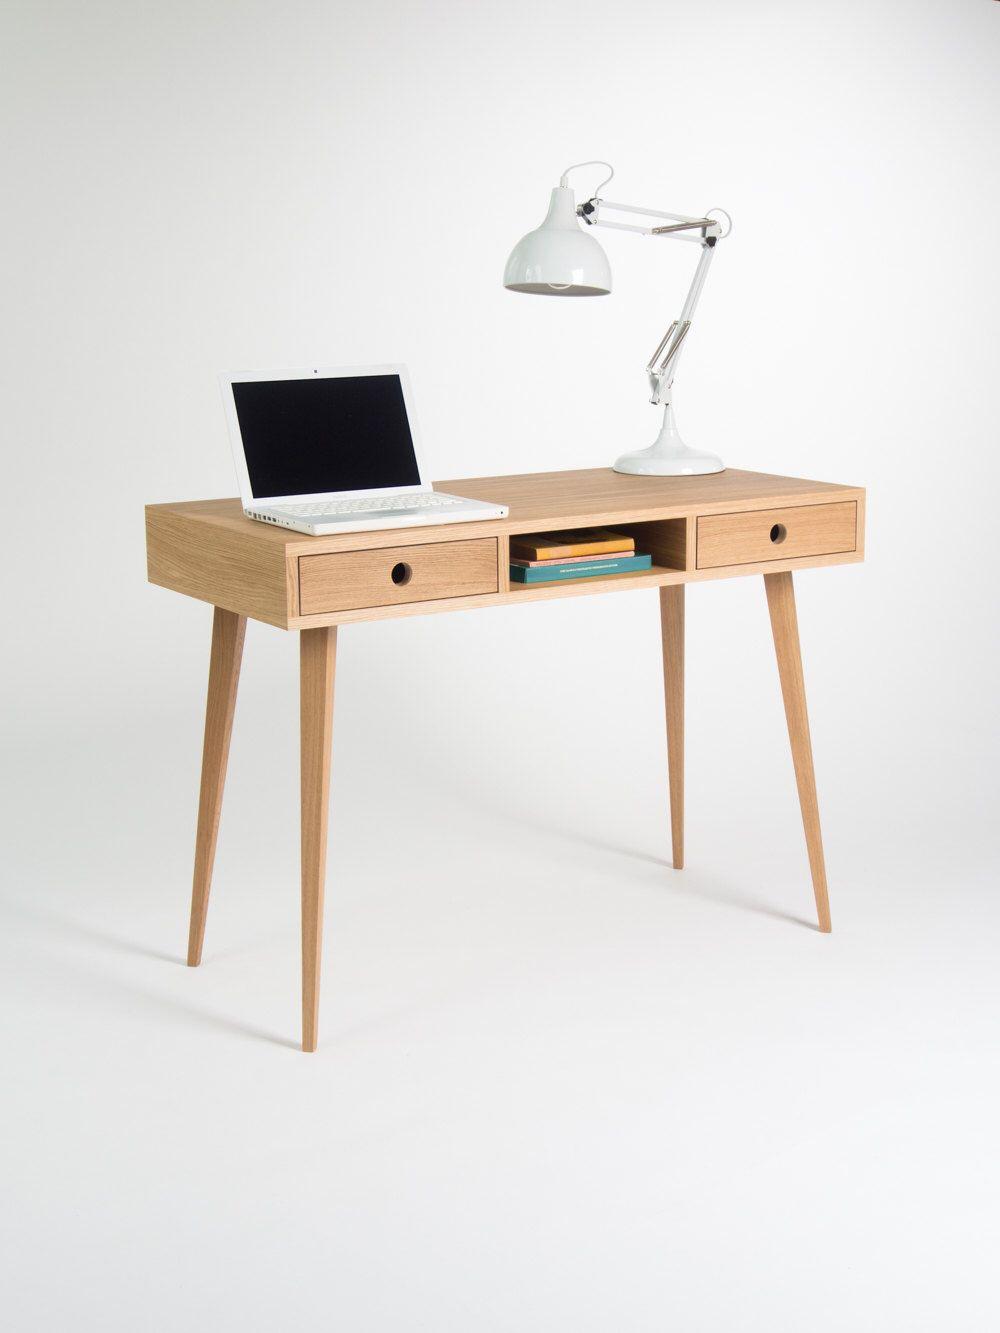 Computer Table Wooden Desk Solid Oak Wood Dressing Table Bureau With Storage Mid Century Modern 140x50 Cm 55x19 5 Modern Scandinavian Furniture Scandinavian Furniture Wooden Desk